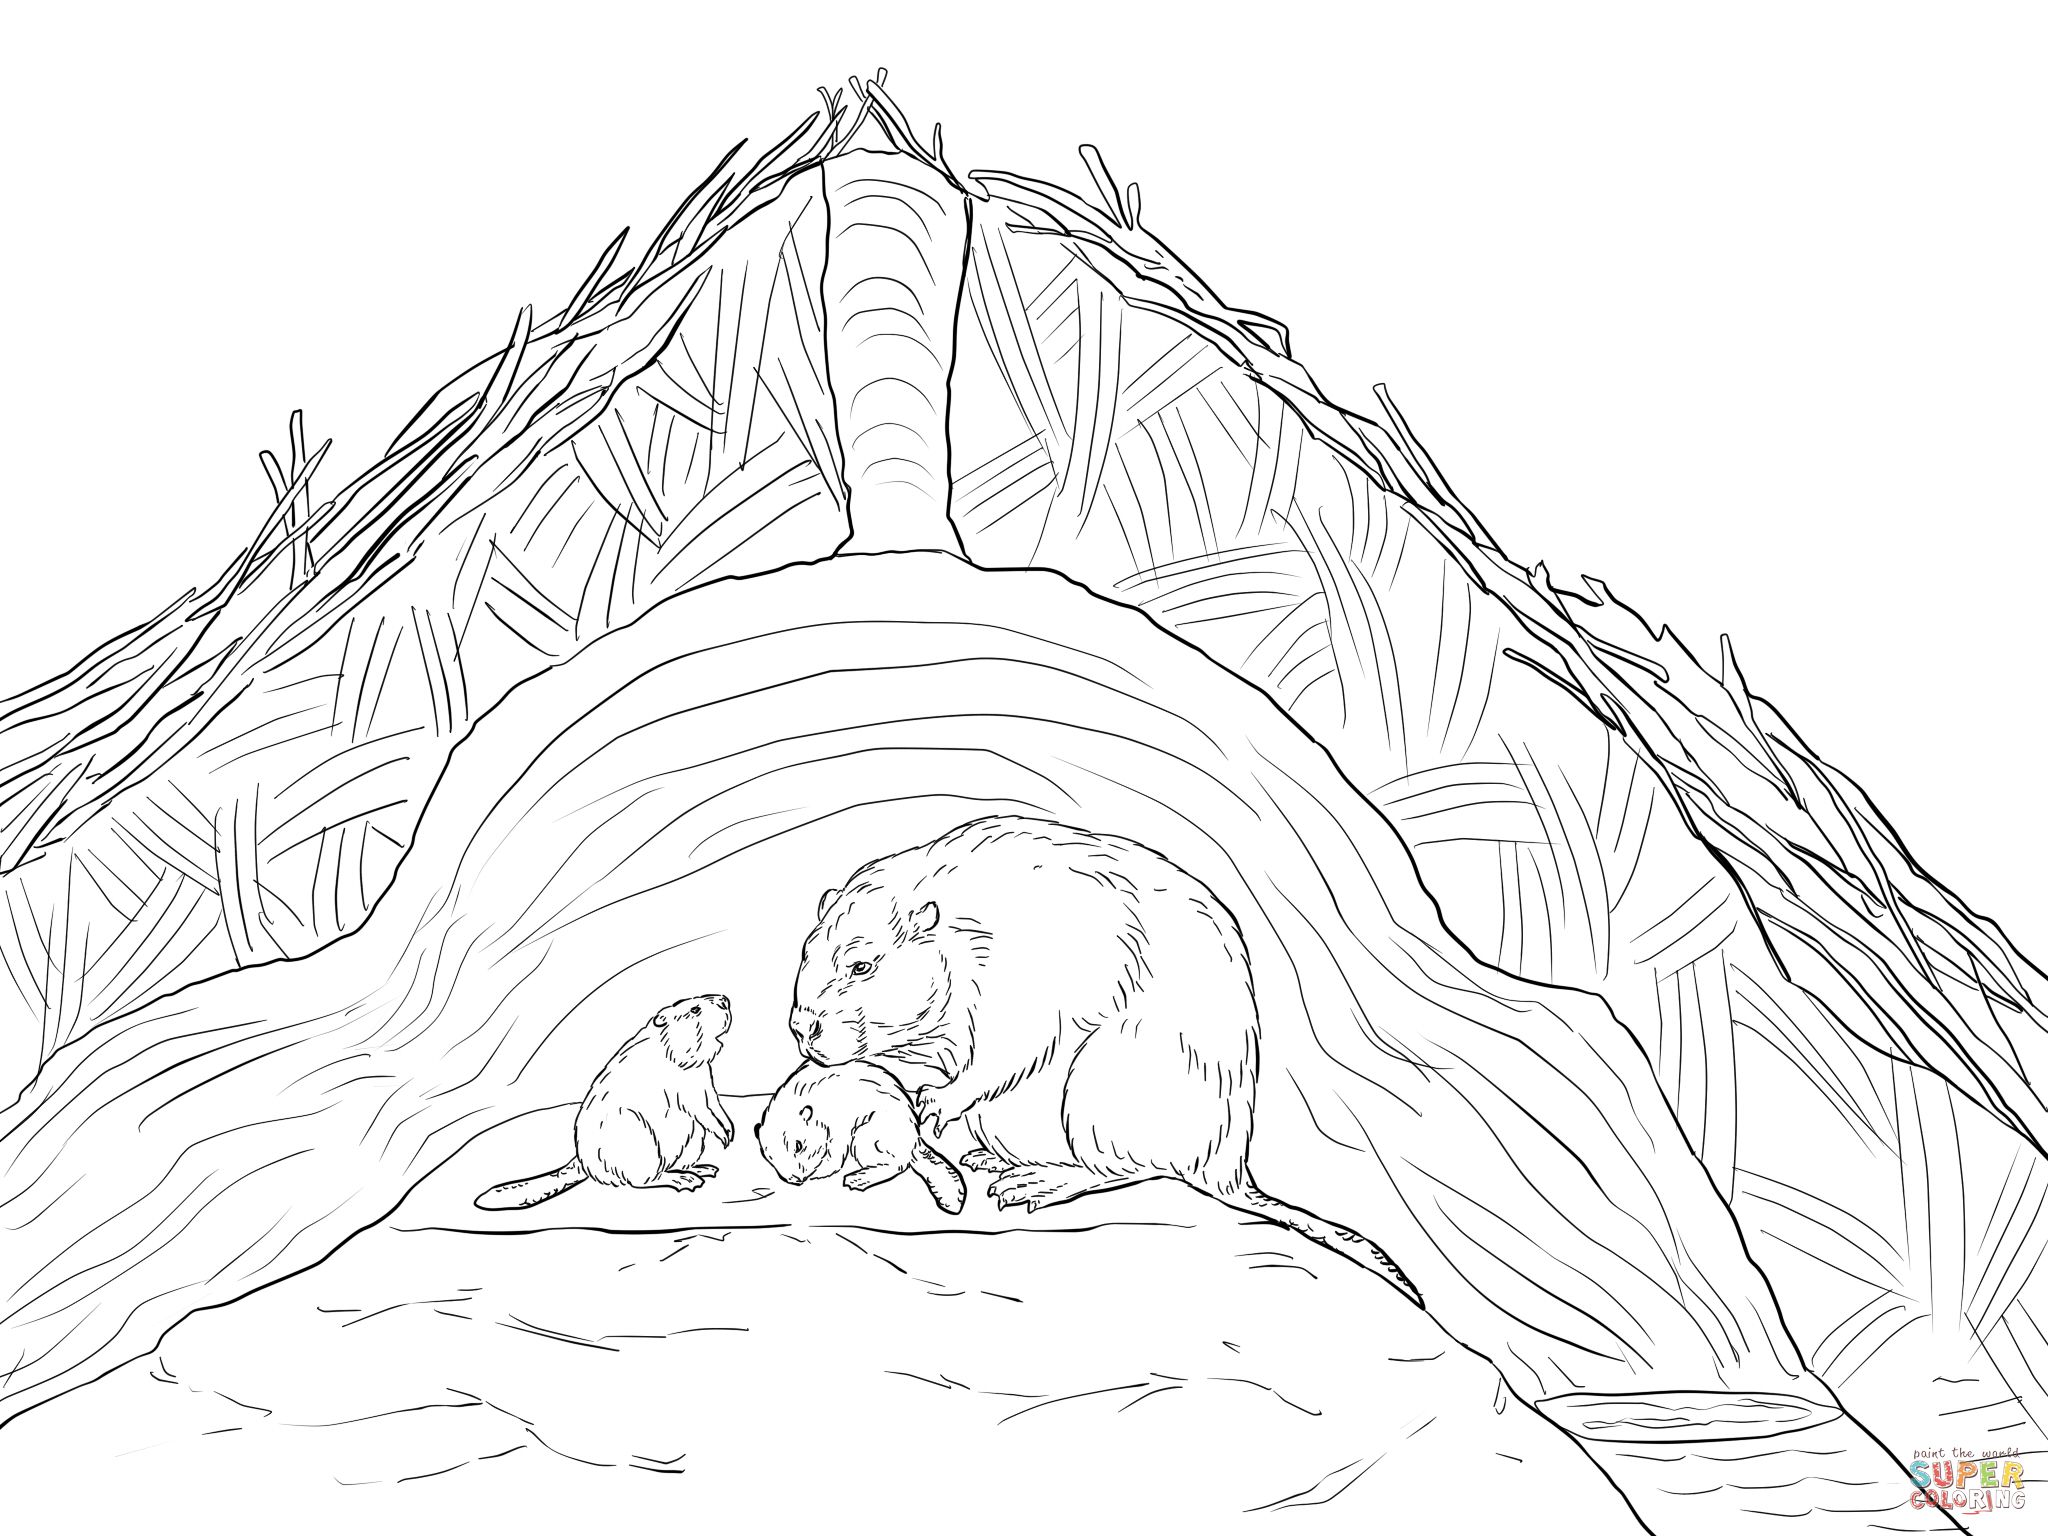 Beaver Lodge Coloring Page Supercoloring Com Beaver Lodge Coloring Pages Free Printable Coloring Pages [ 1536 x 2048 Pixel ]